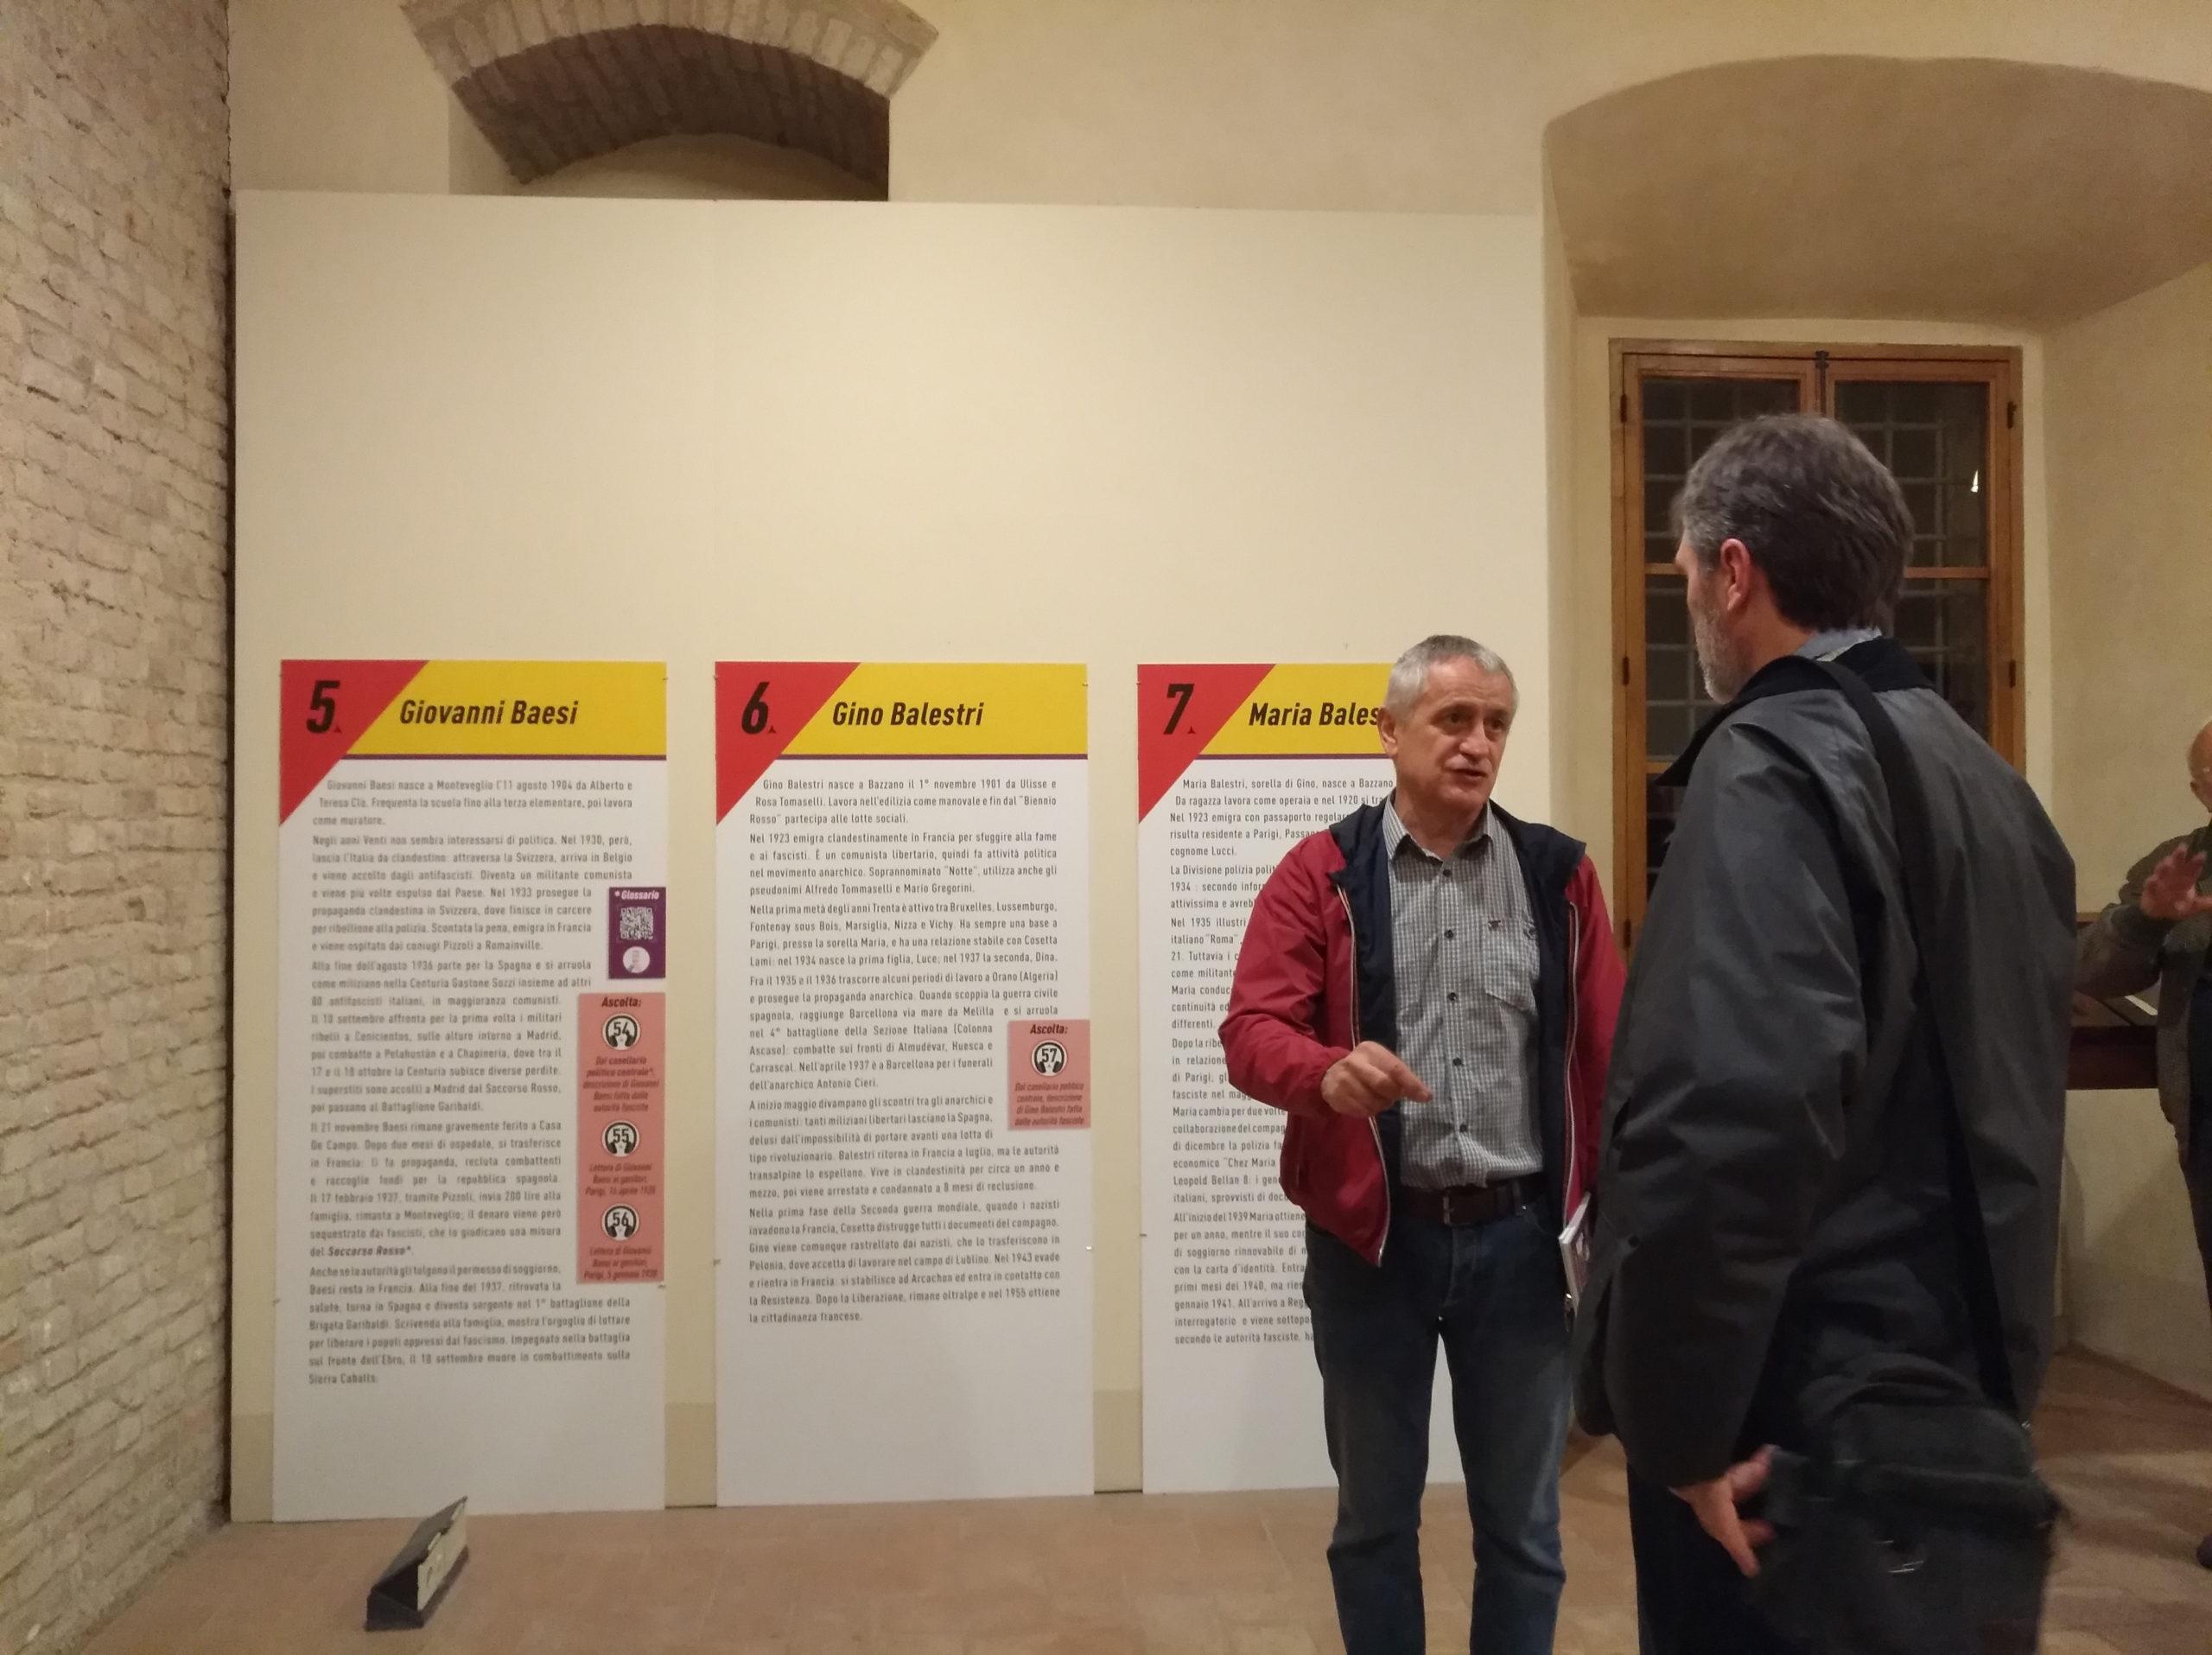 antifascismo e guerra civile spagnola